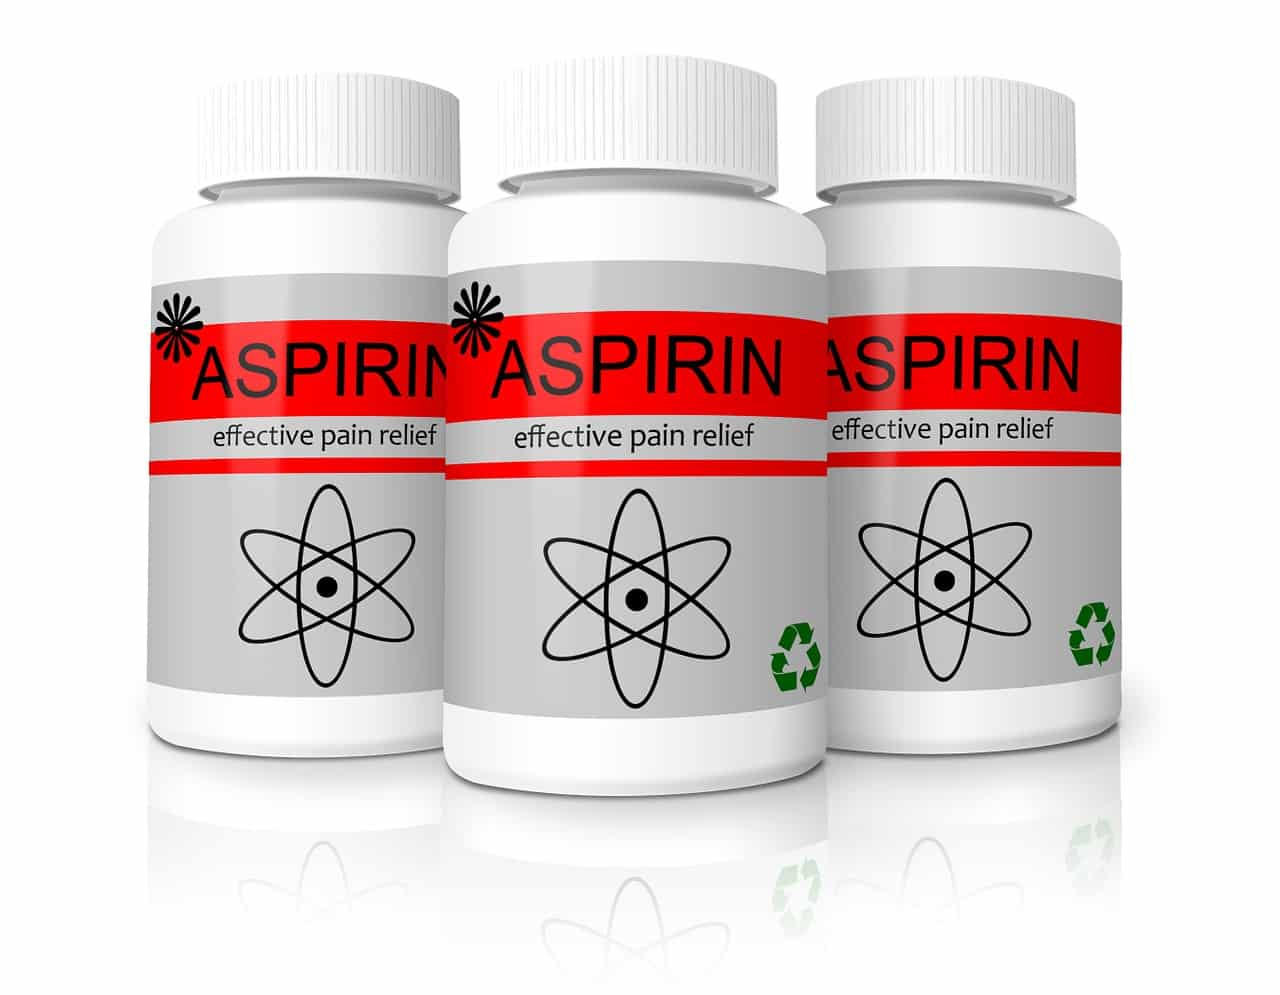 Aspirina Prospect